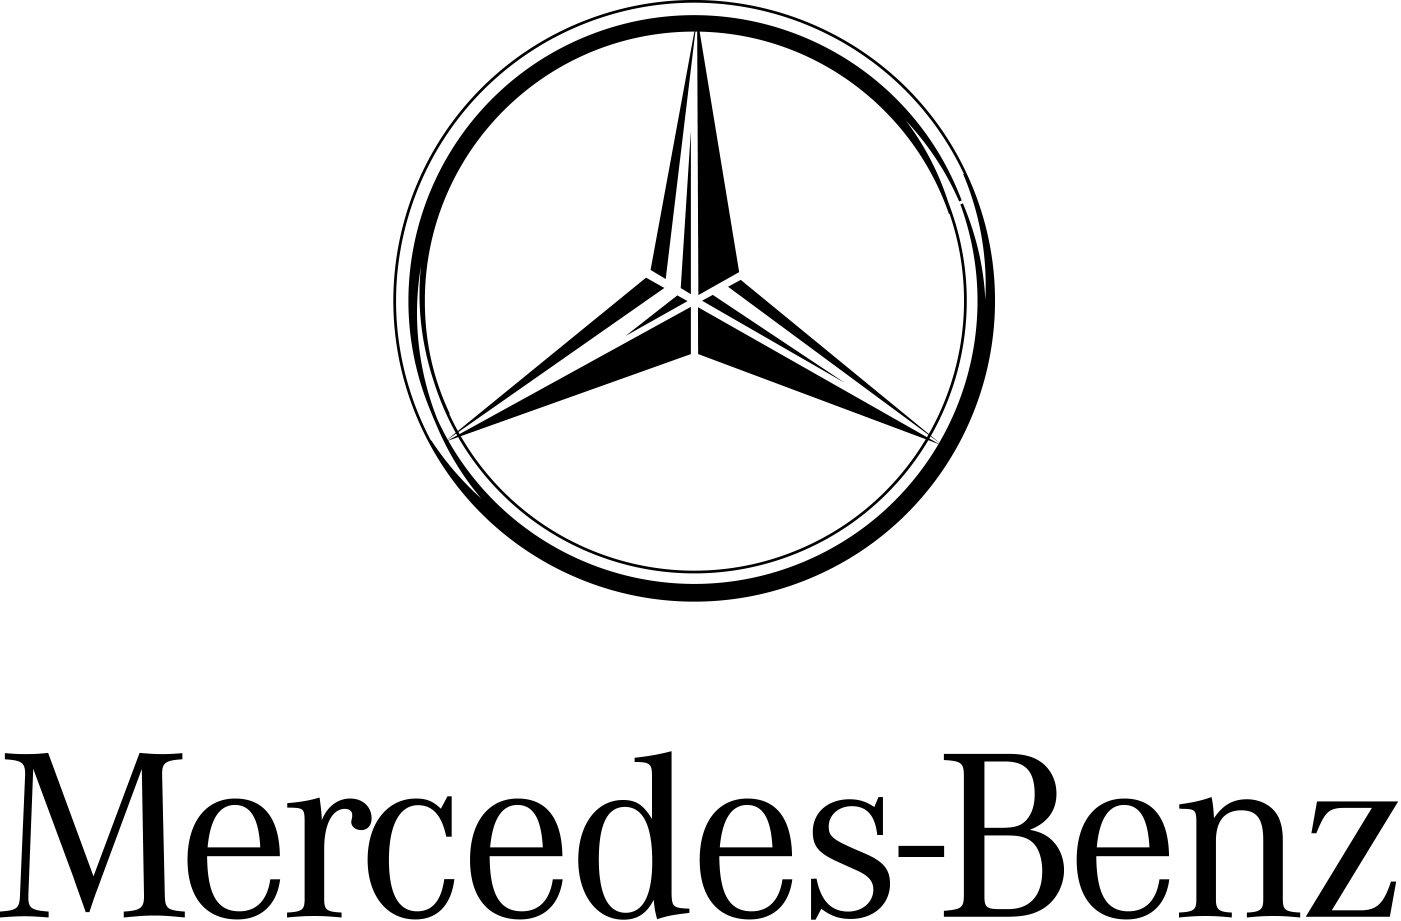 Mercedes-Benz A-Class Premiere Amsterdam